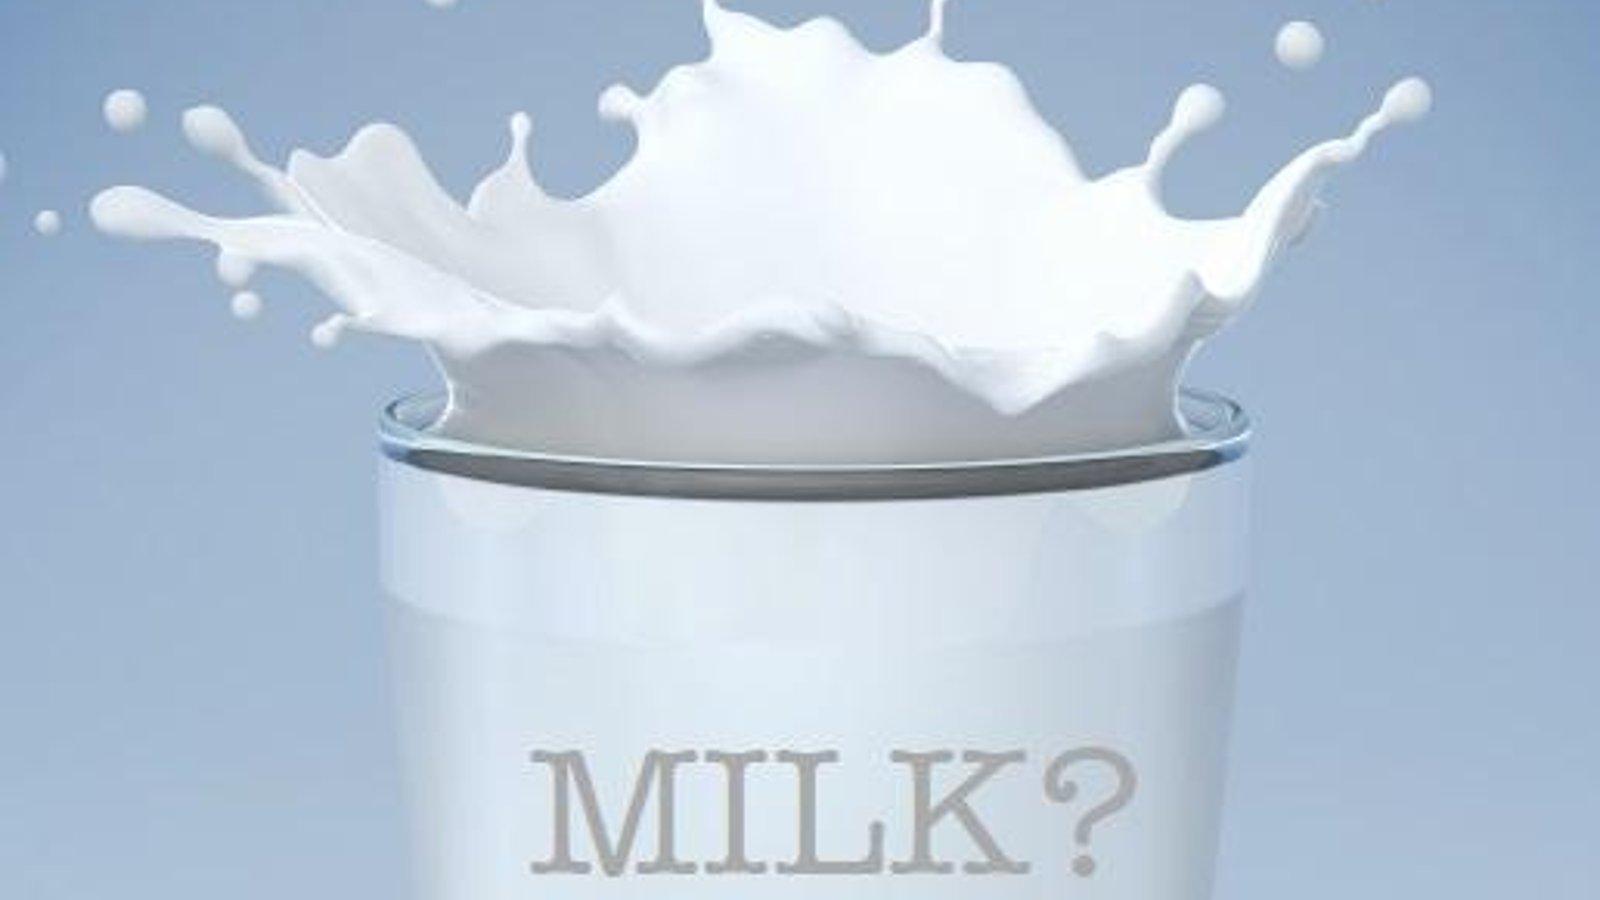 Milk? - Investigating the Nutritional Value of Milk